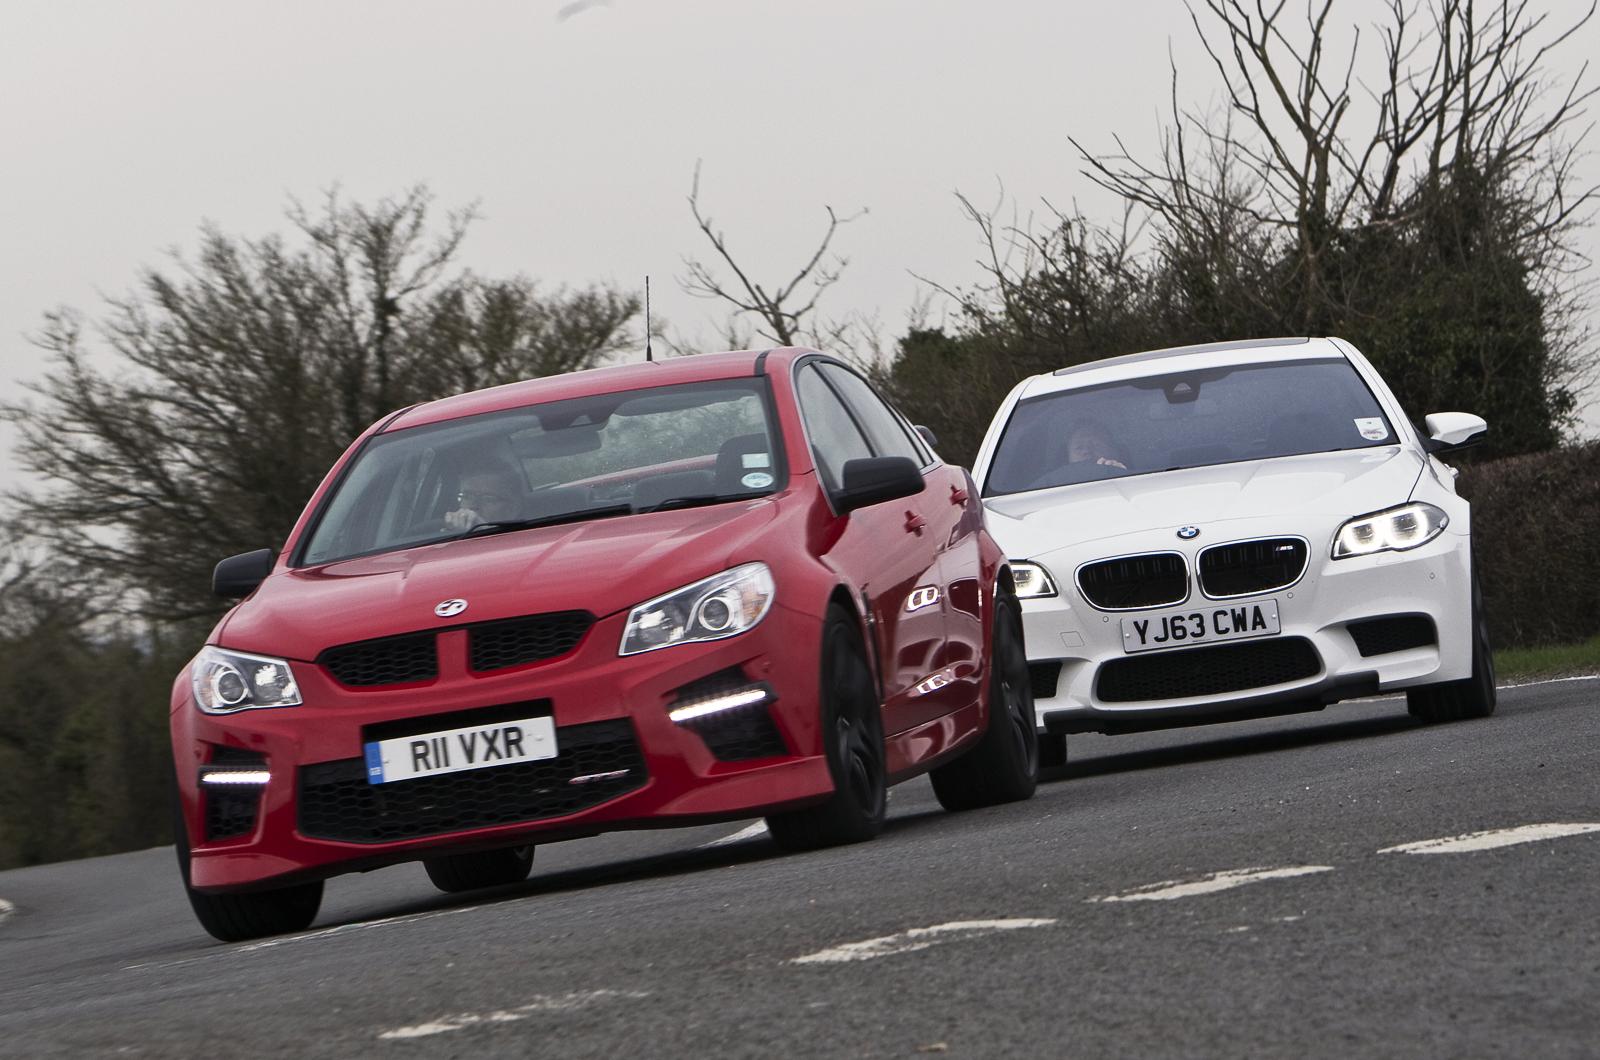 Vauxhall vauxhall vxr8 estate : Battle of the super-saloons: BMW M5 vs. Vauxhall VXR8